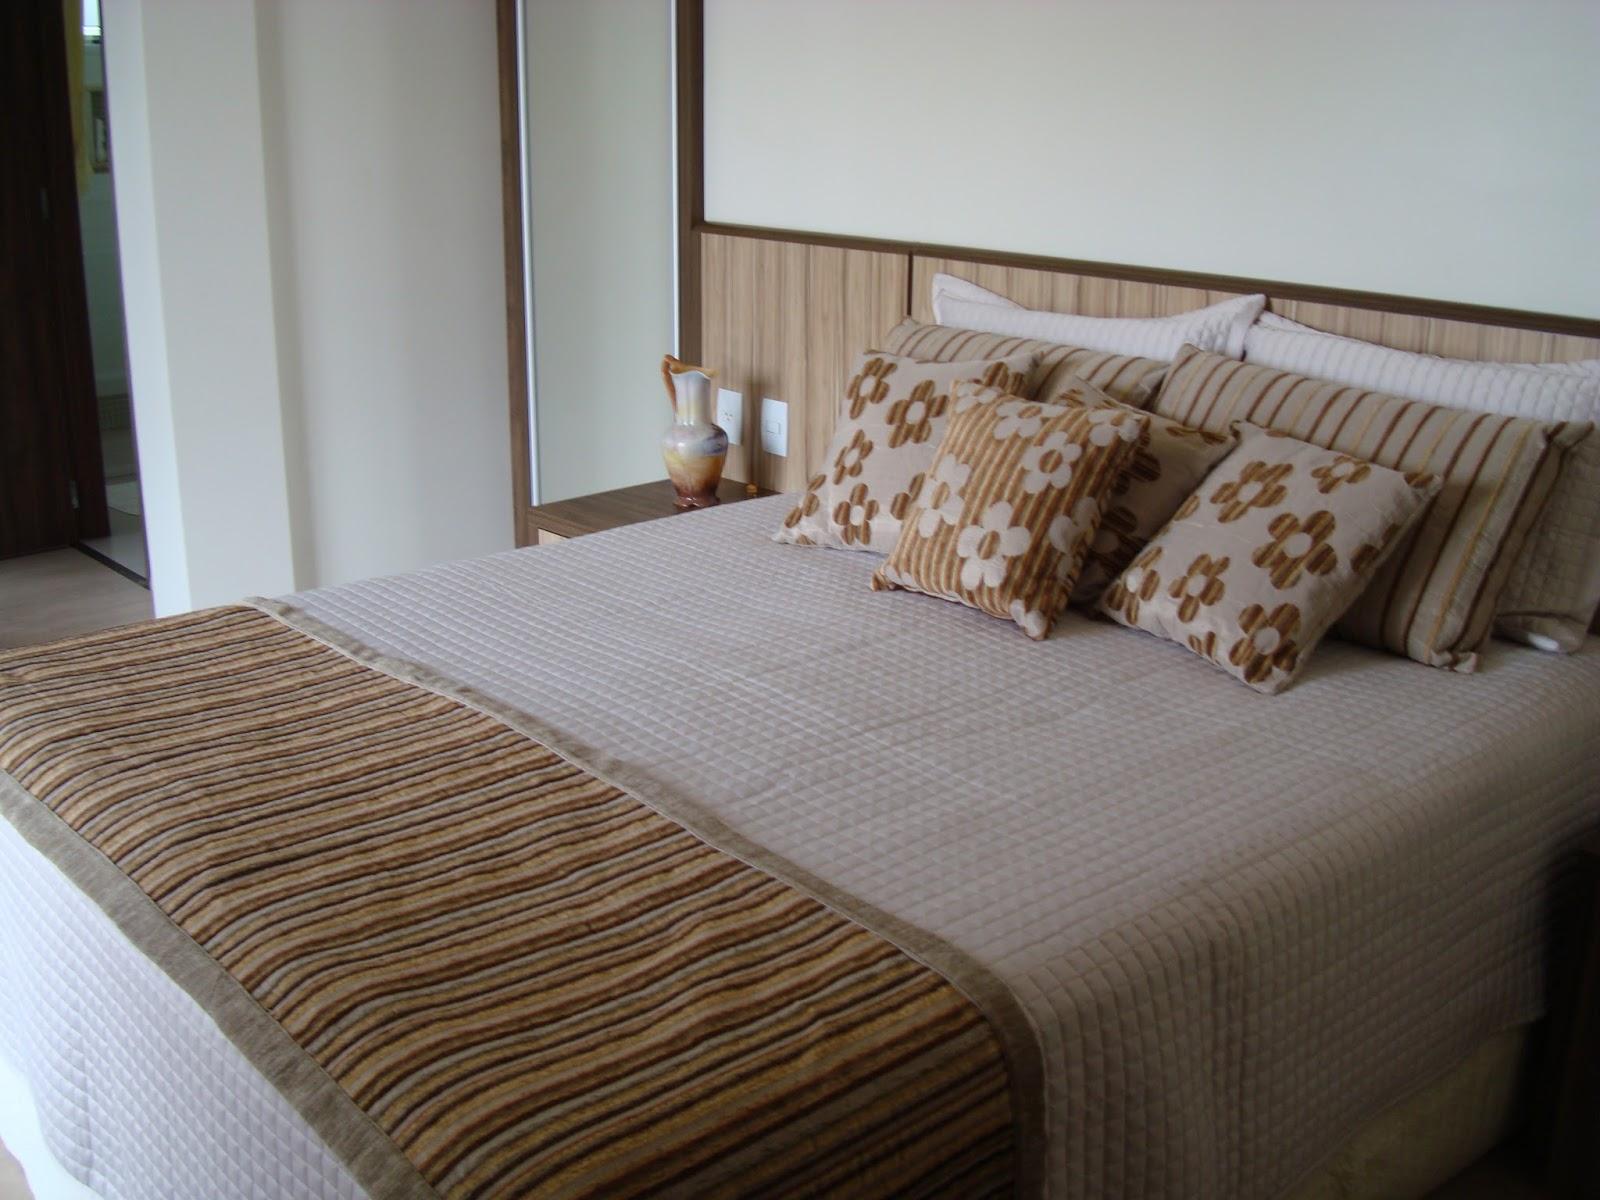 Arquiteta patr cia vertuan arrumando a cama de casal - Ikea mantas para camas ...